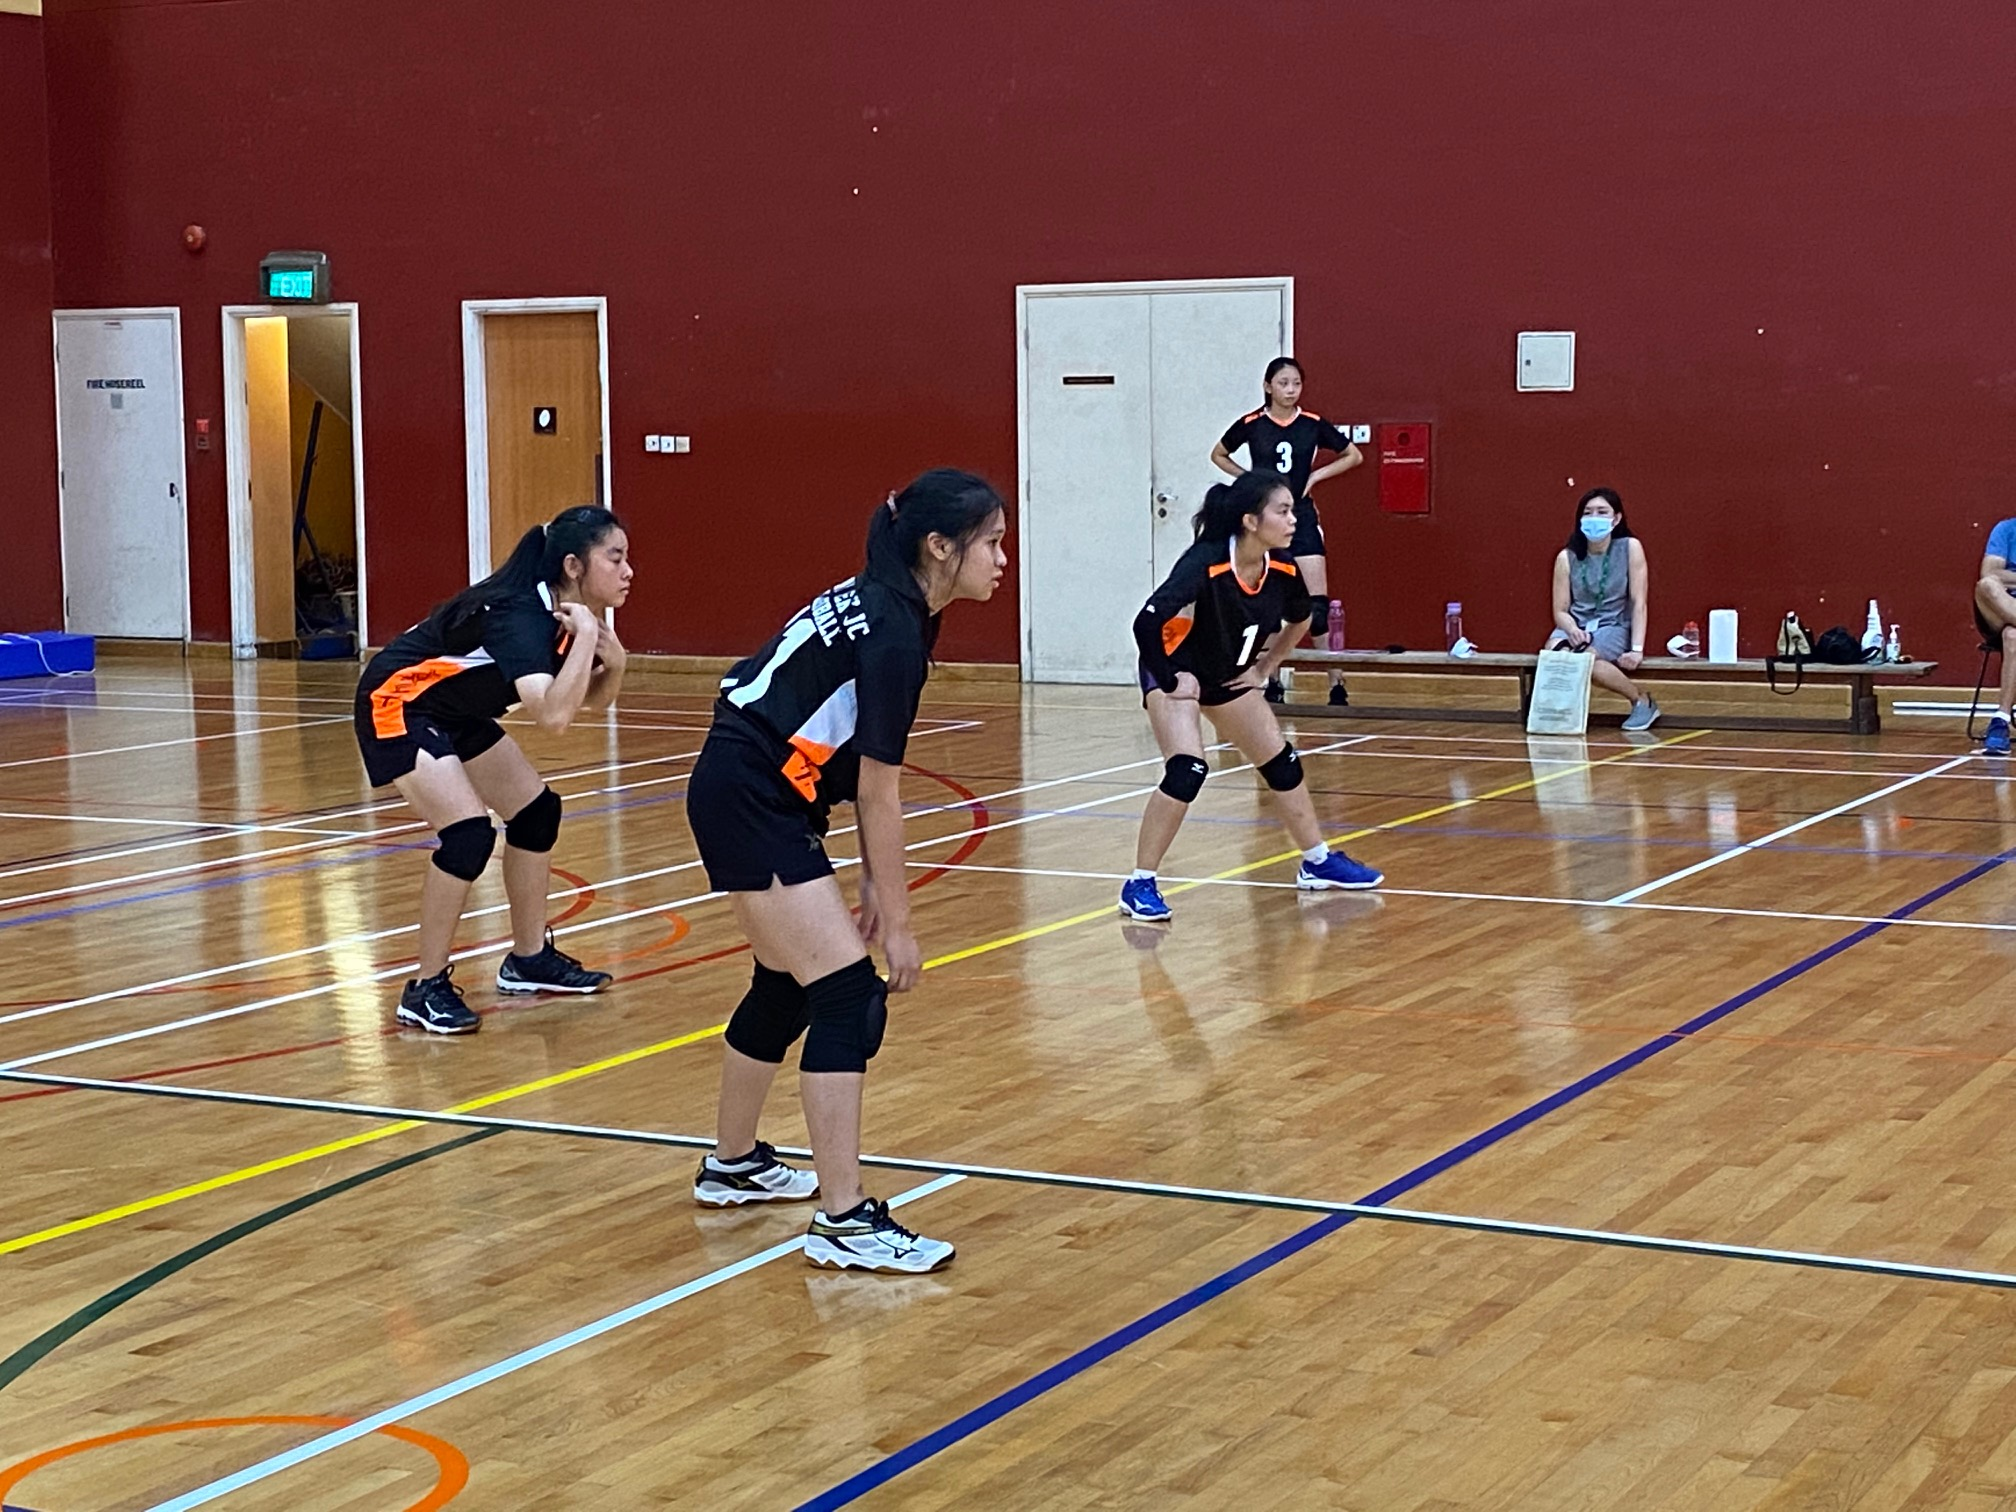 NSG A Div girls' volleyball prelim rd - ACJC (red) vs TJC (black) 6